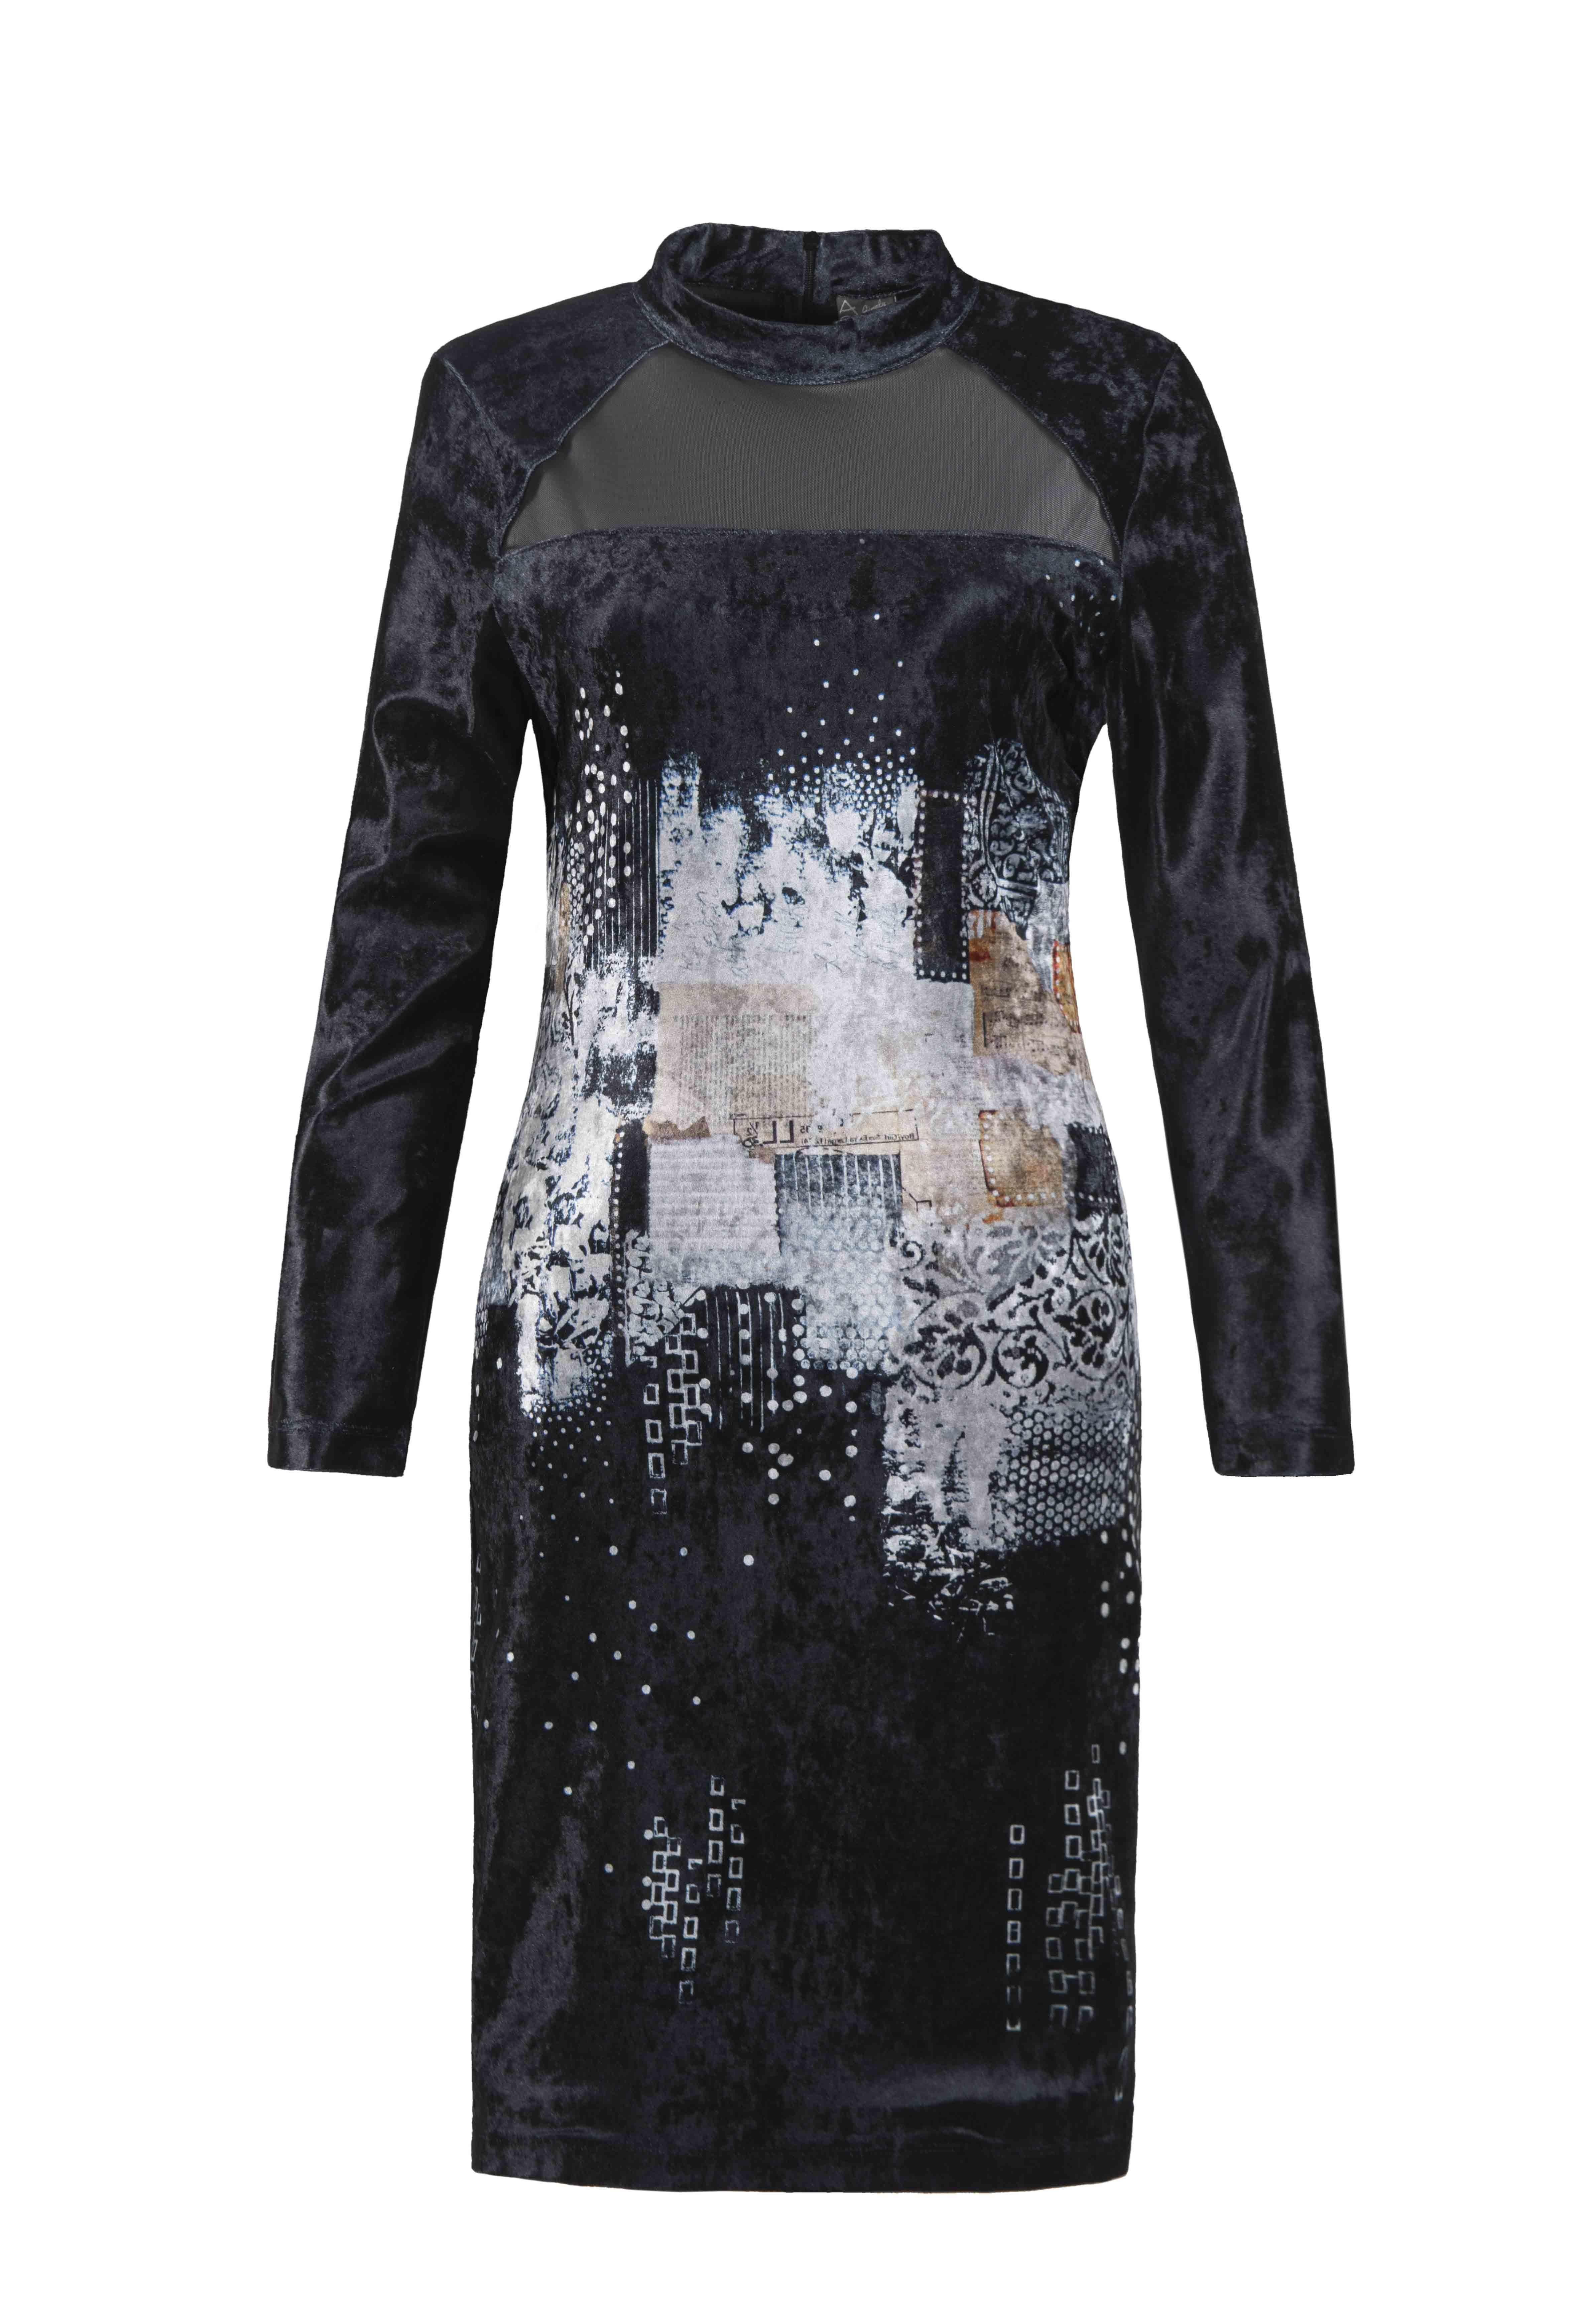 Simply Art Dolcezza: Explosion of Crystals Abstract Art Velvet Dress (1 Left!)